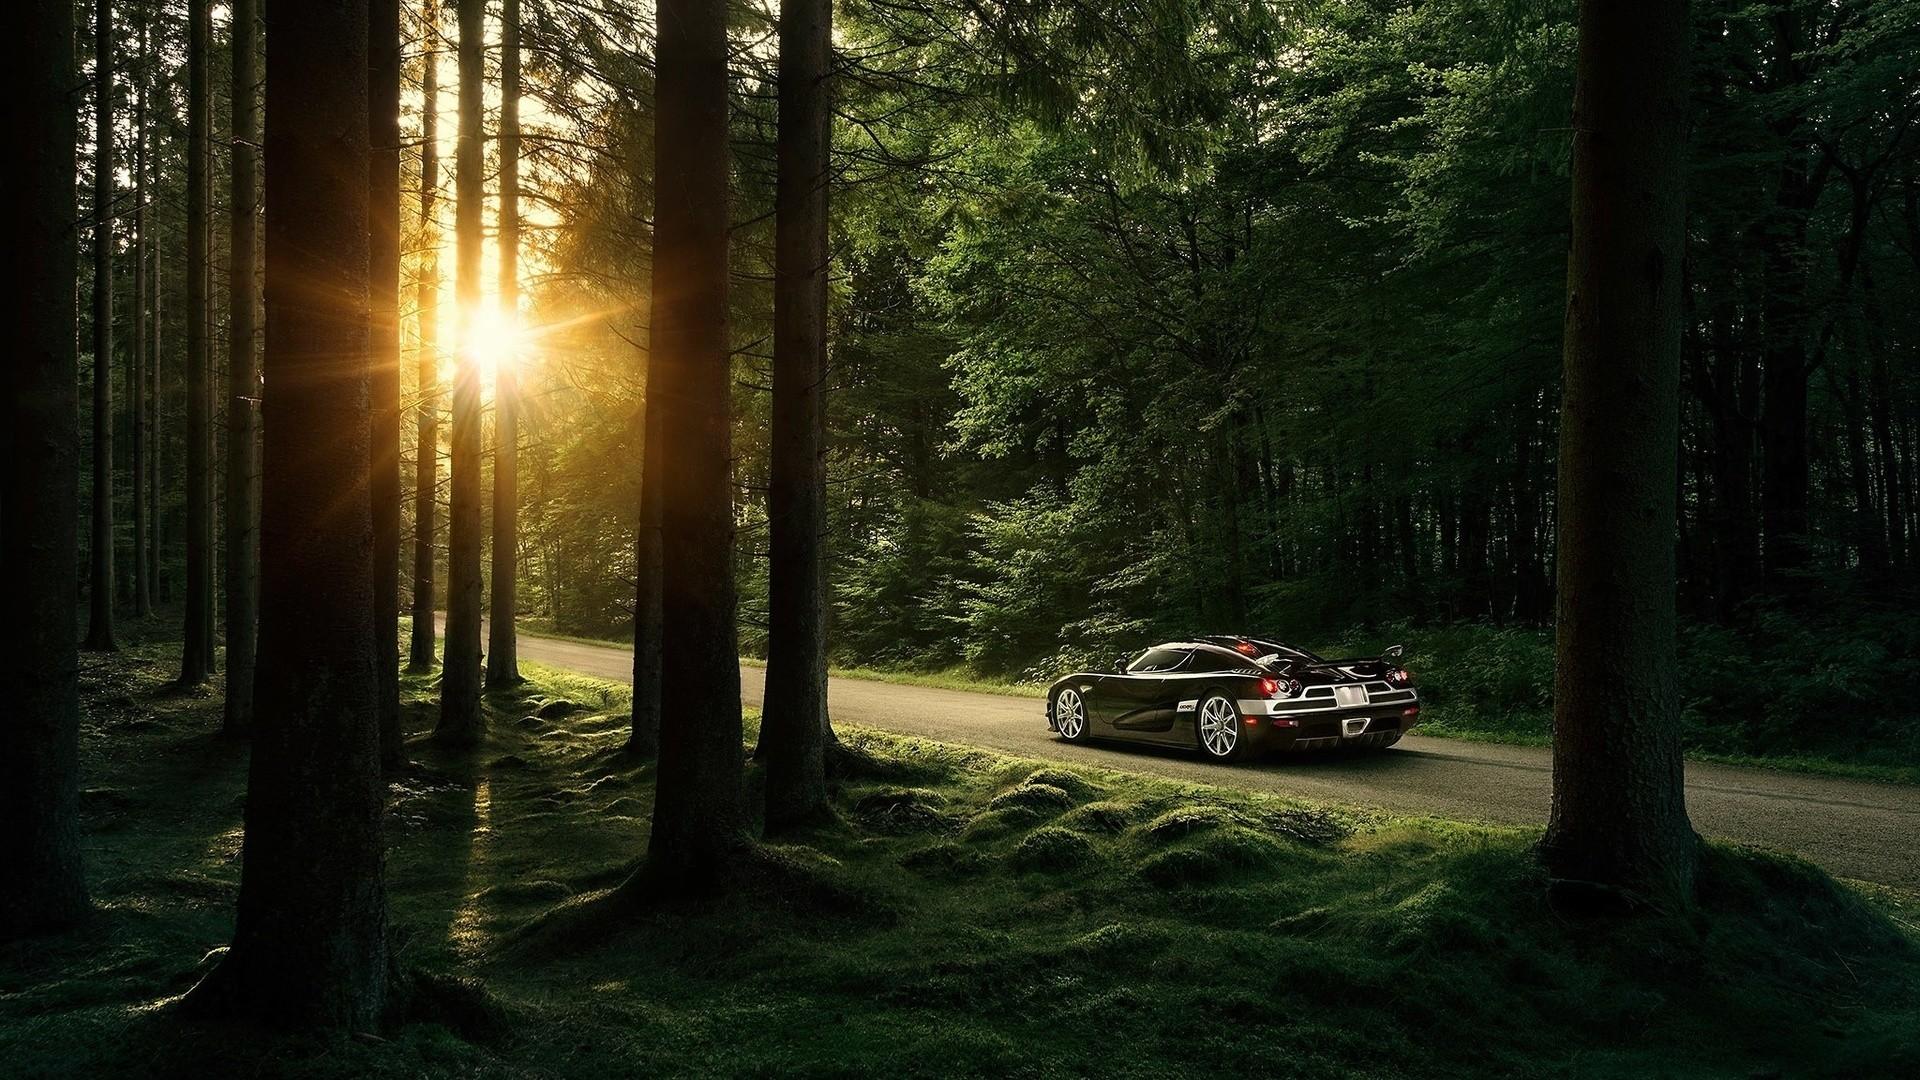 Forest Sunlight Image